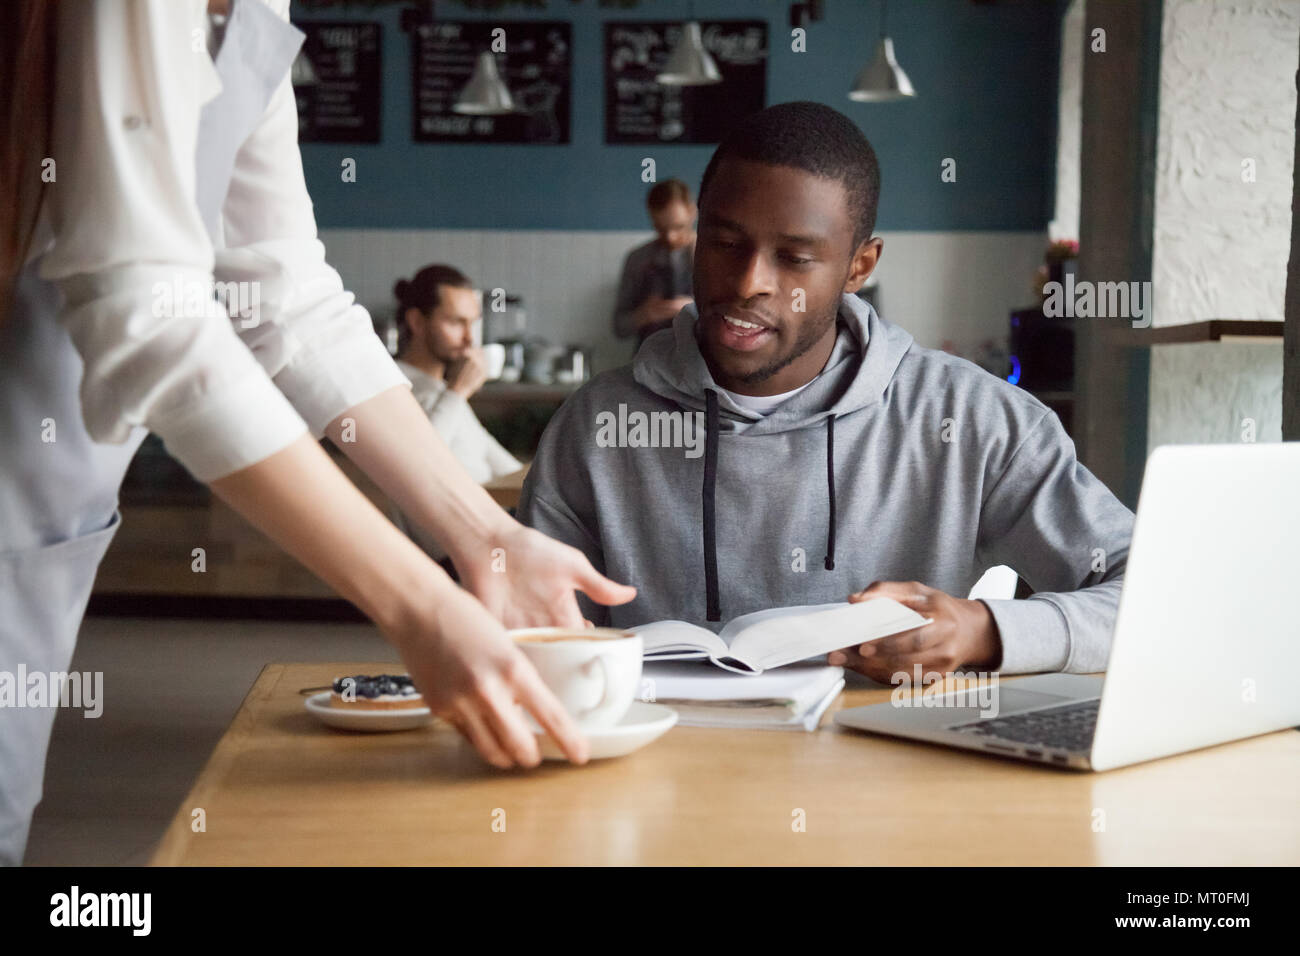 Kellnerin Kaffee zu lächeln, african-american man Kunden mit Stockbild